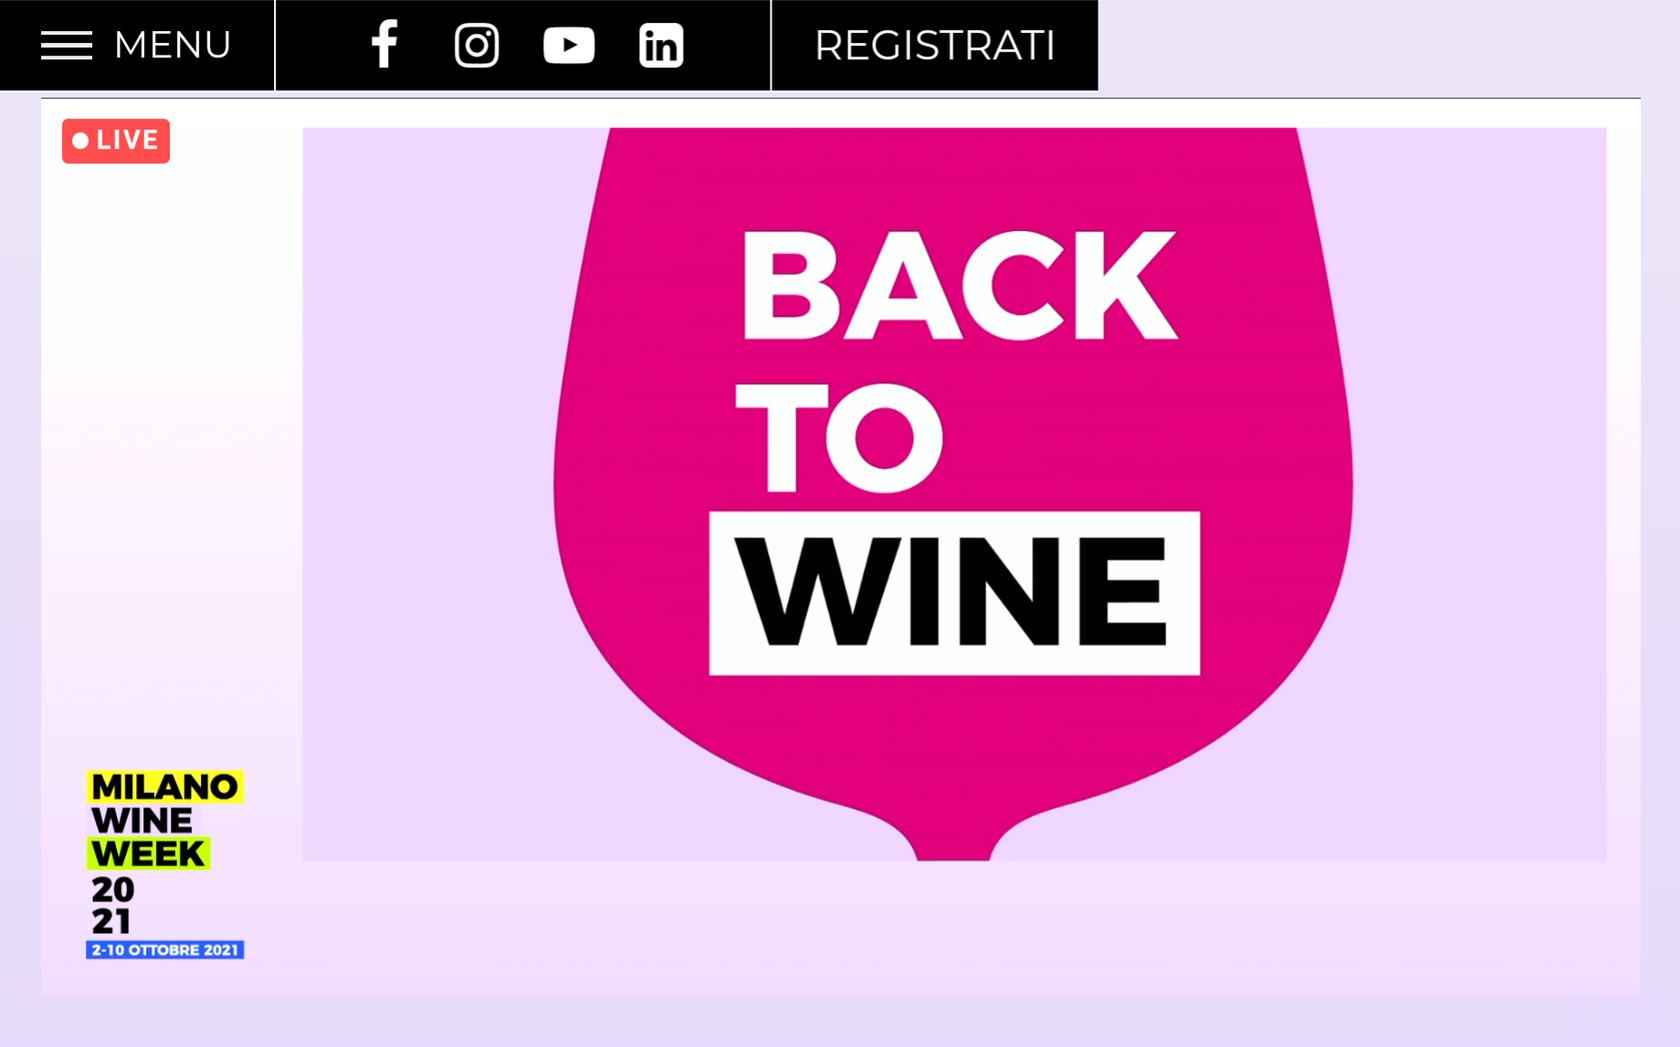 Back to Wine Milano Wine Week 2021